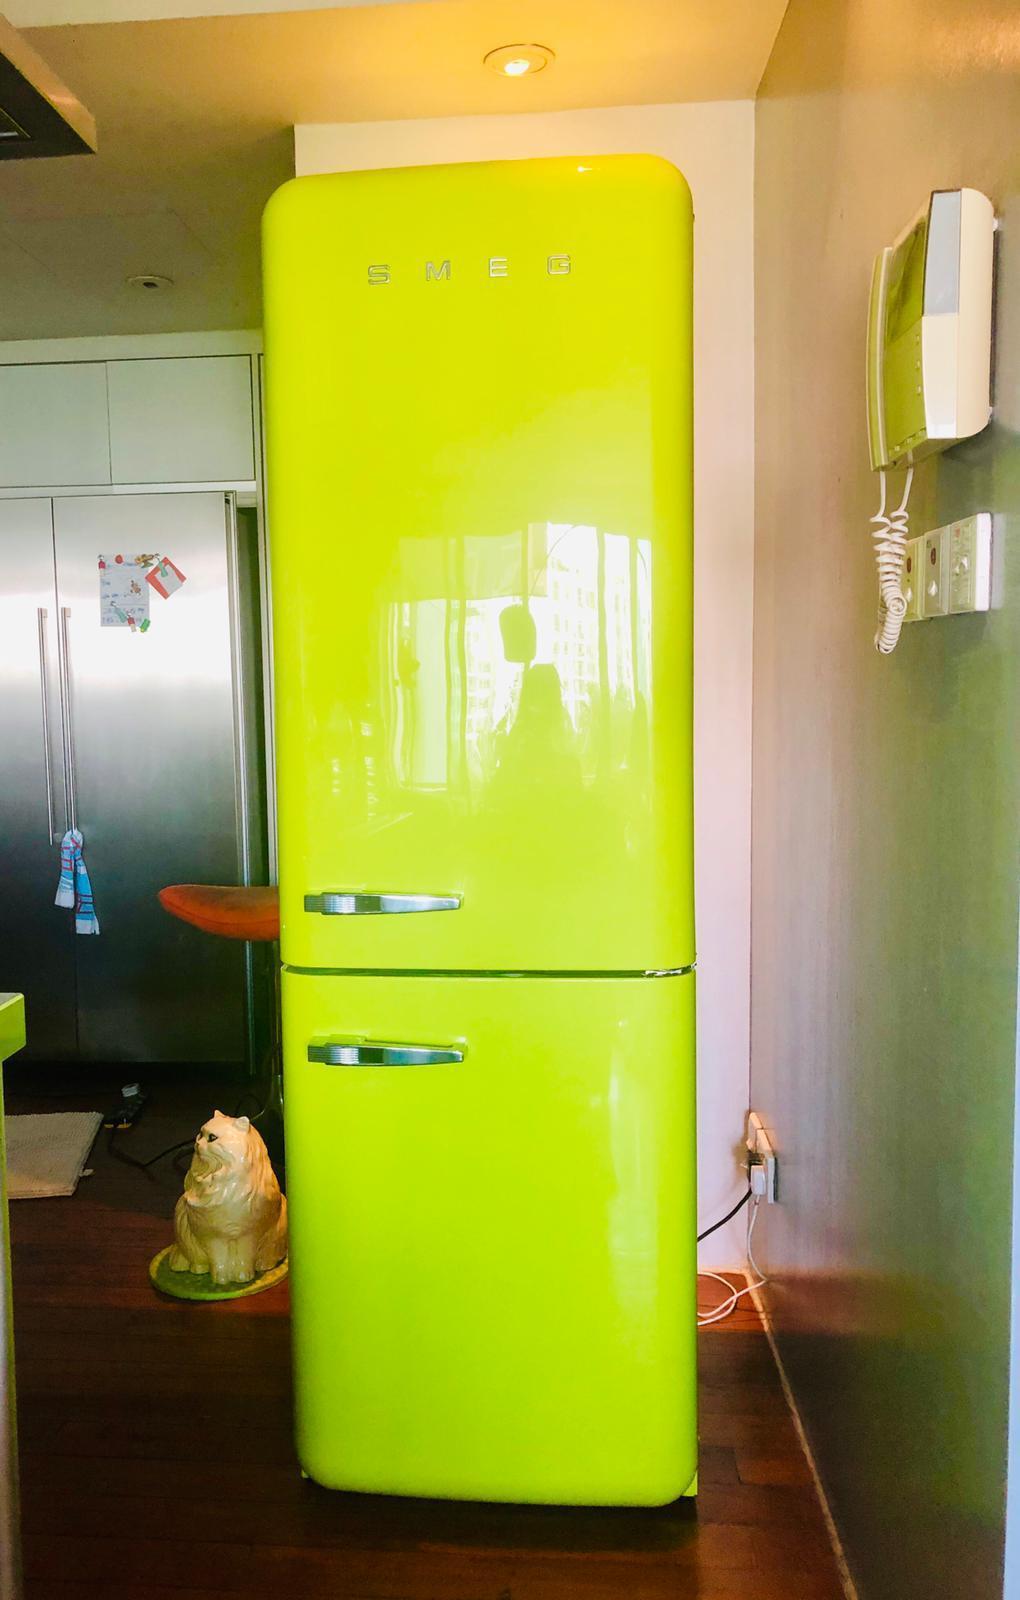 smeg_fridge_fab32_retro_fridge_lime_green_by_born_in_colour_singapore_furniture_online